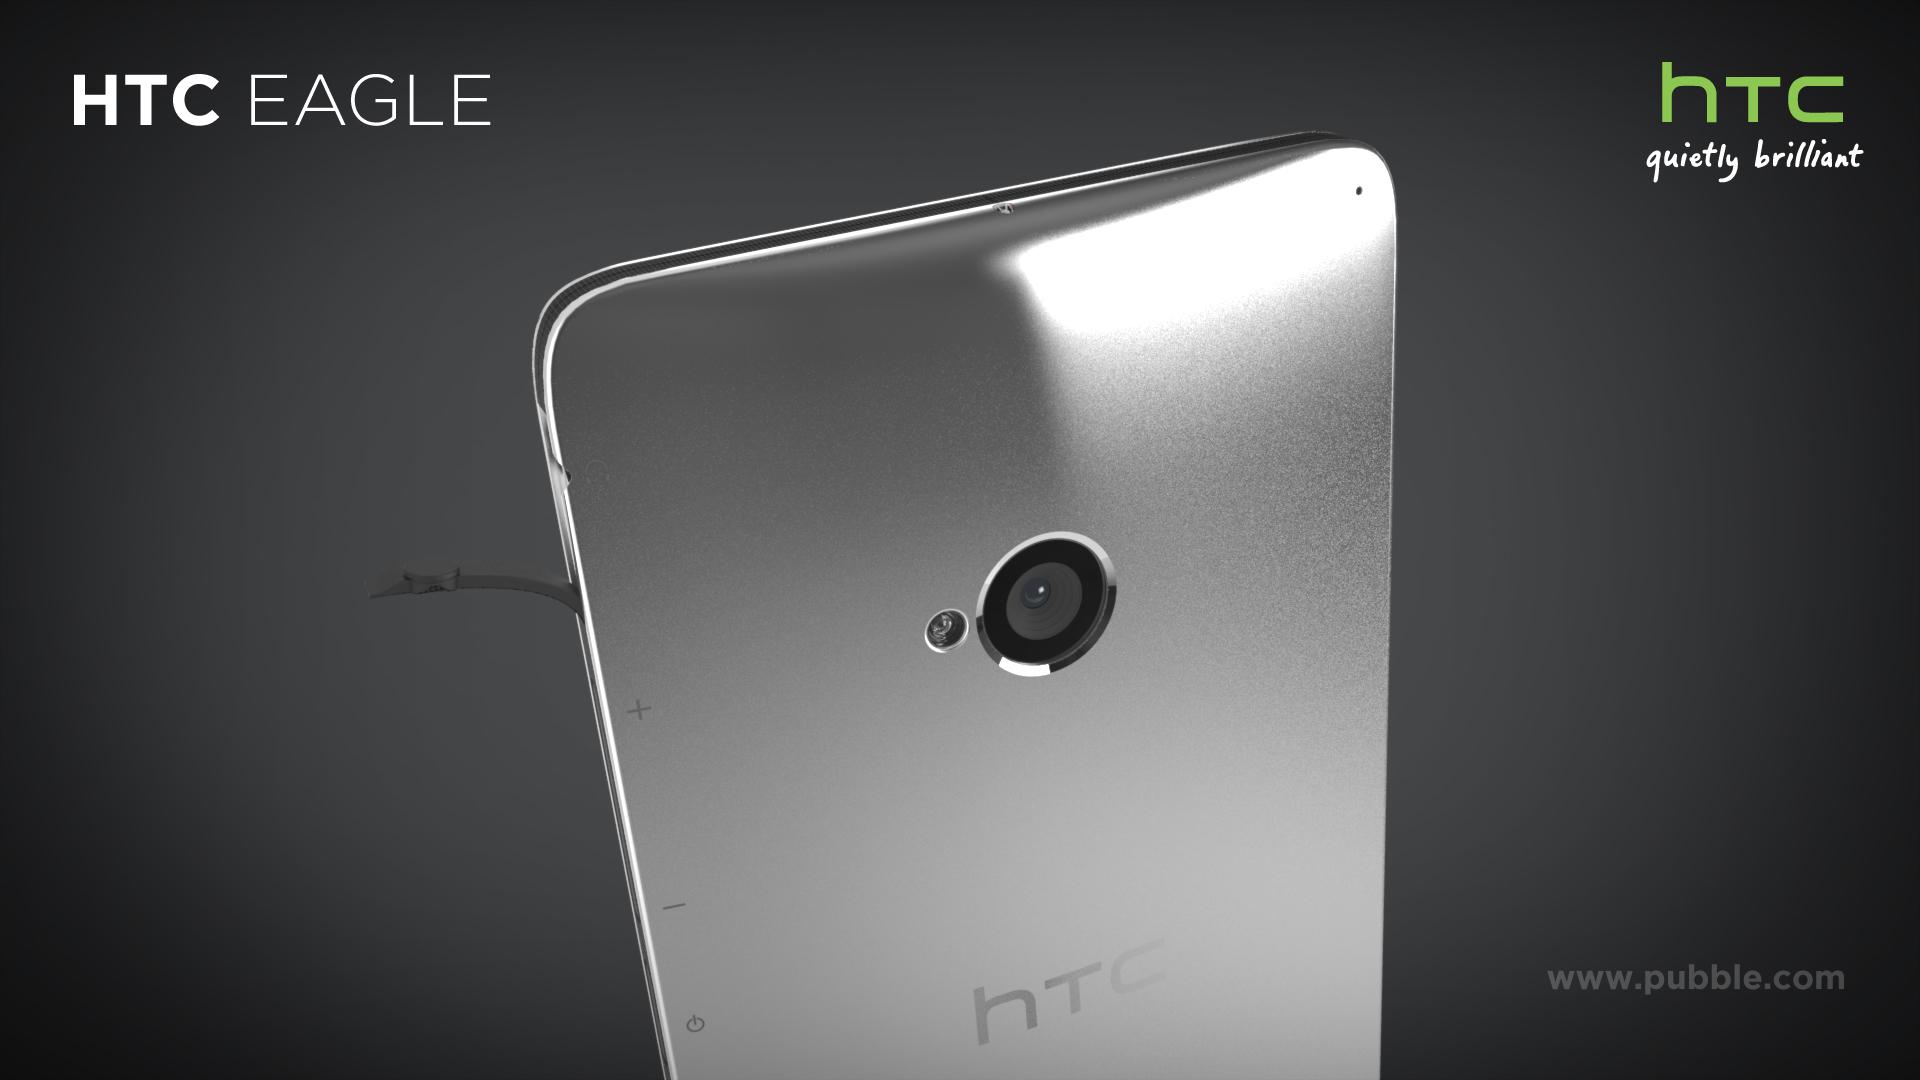 HTC Eagle - APN 1